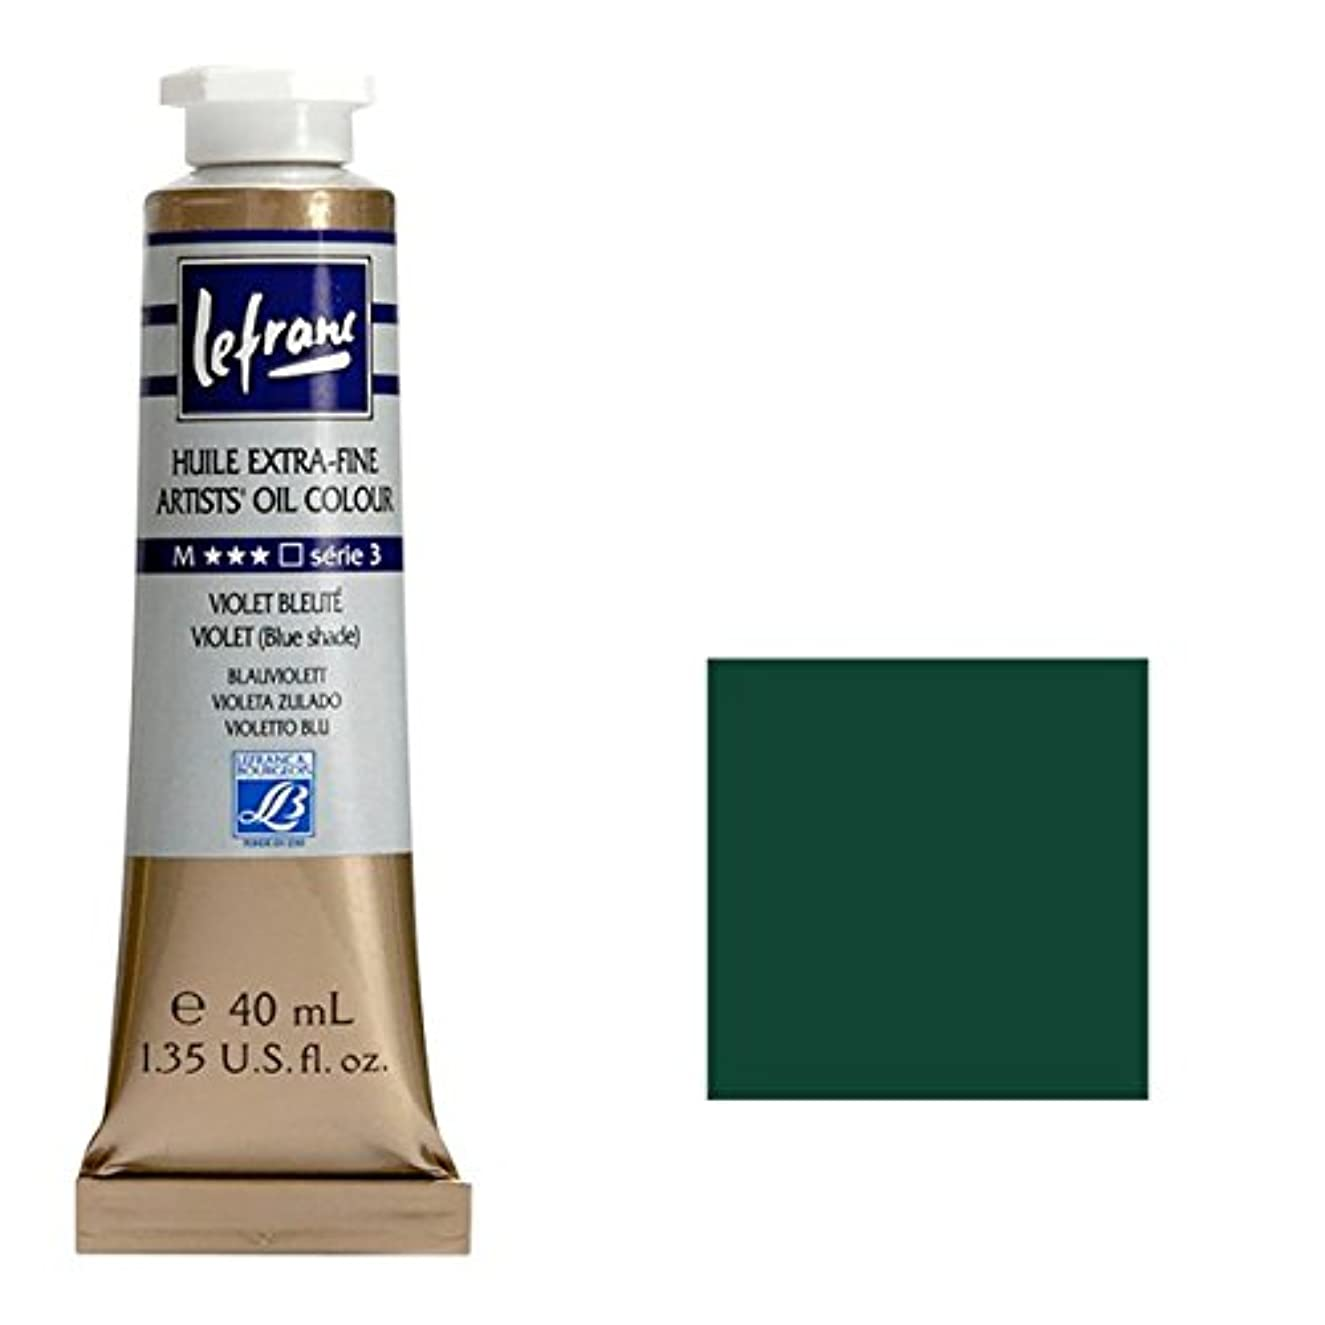 Lefranc & Bourgeois Artists Oil Paint, Oil-Based Paint, Saftgrün Permanent, ?l - Farbe, 40ml Tube